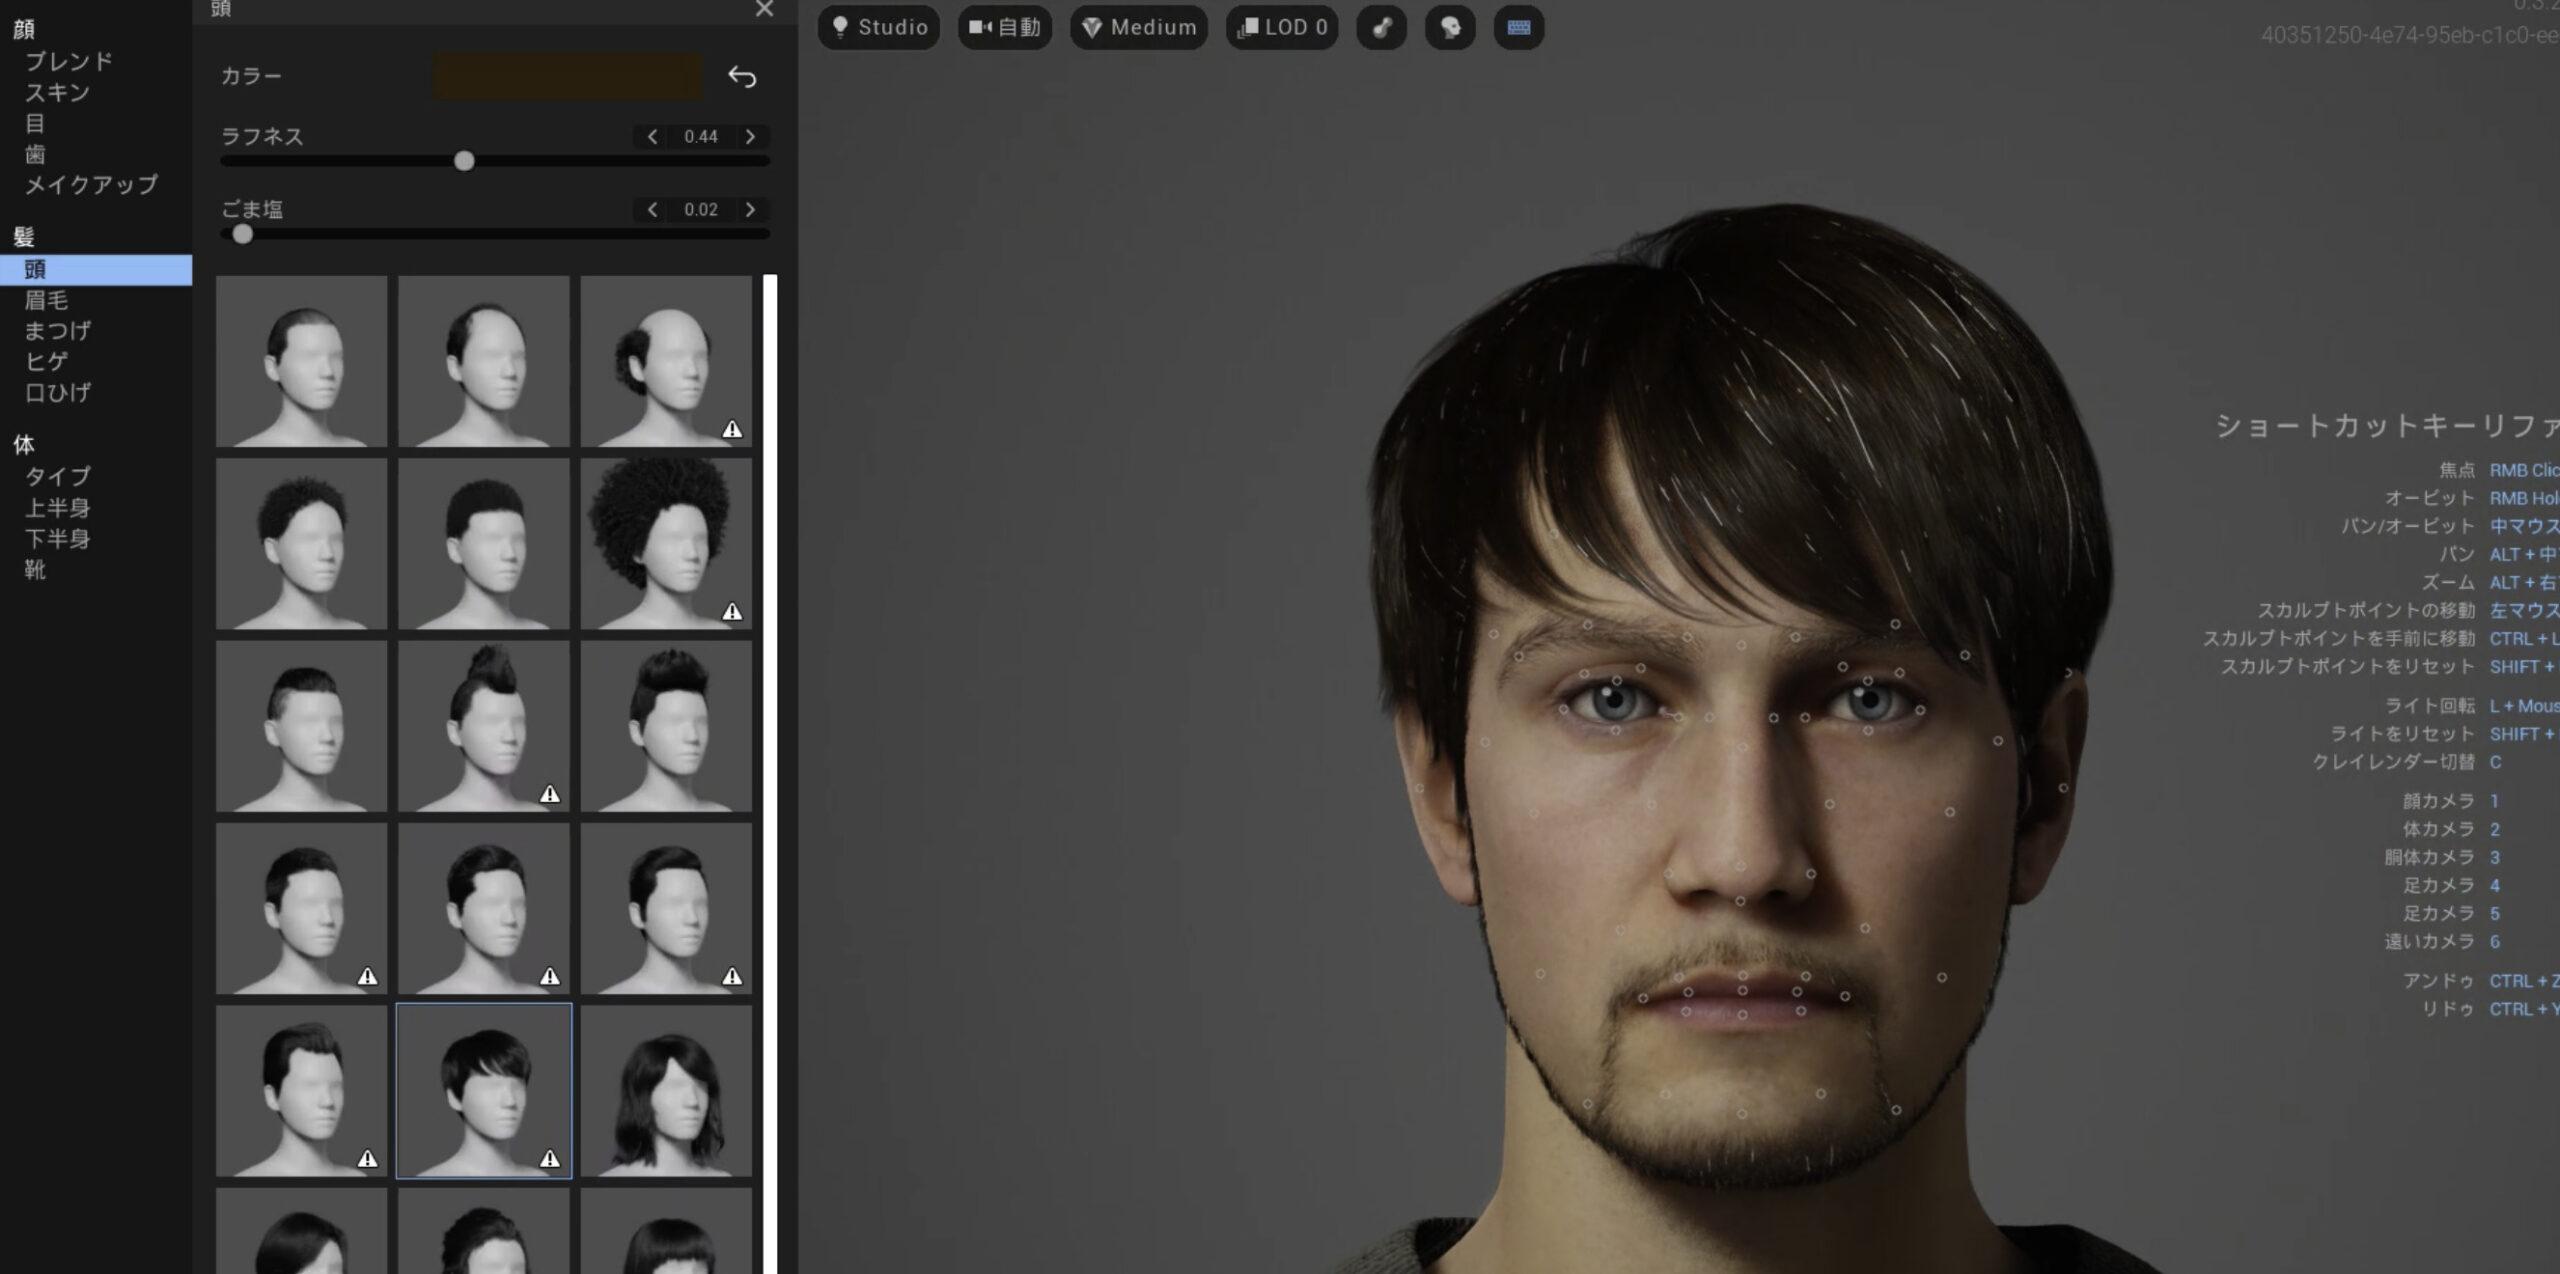 MetaHuman Creatorで3Dの人物モデルを高クオリティで作る!